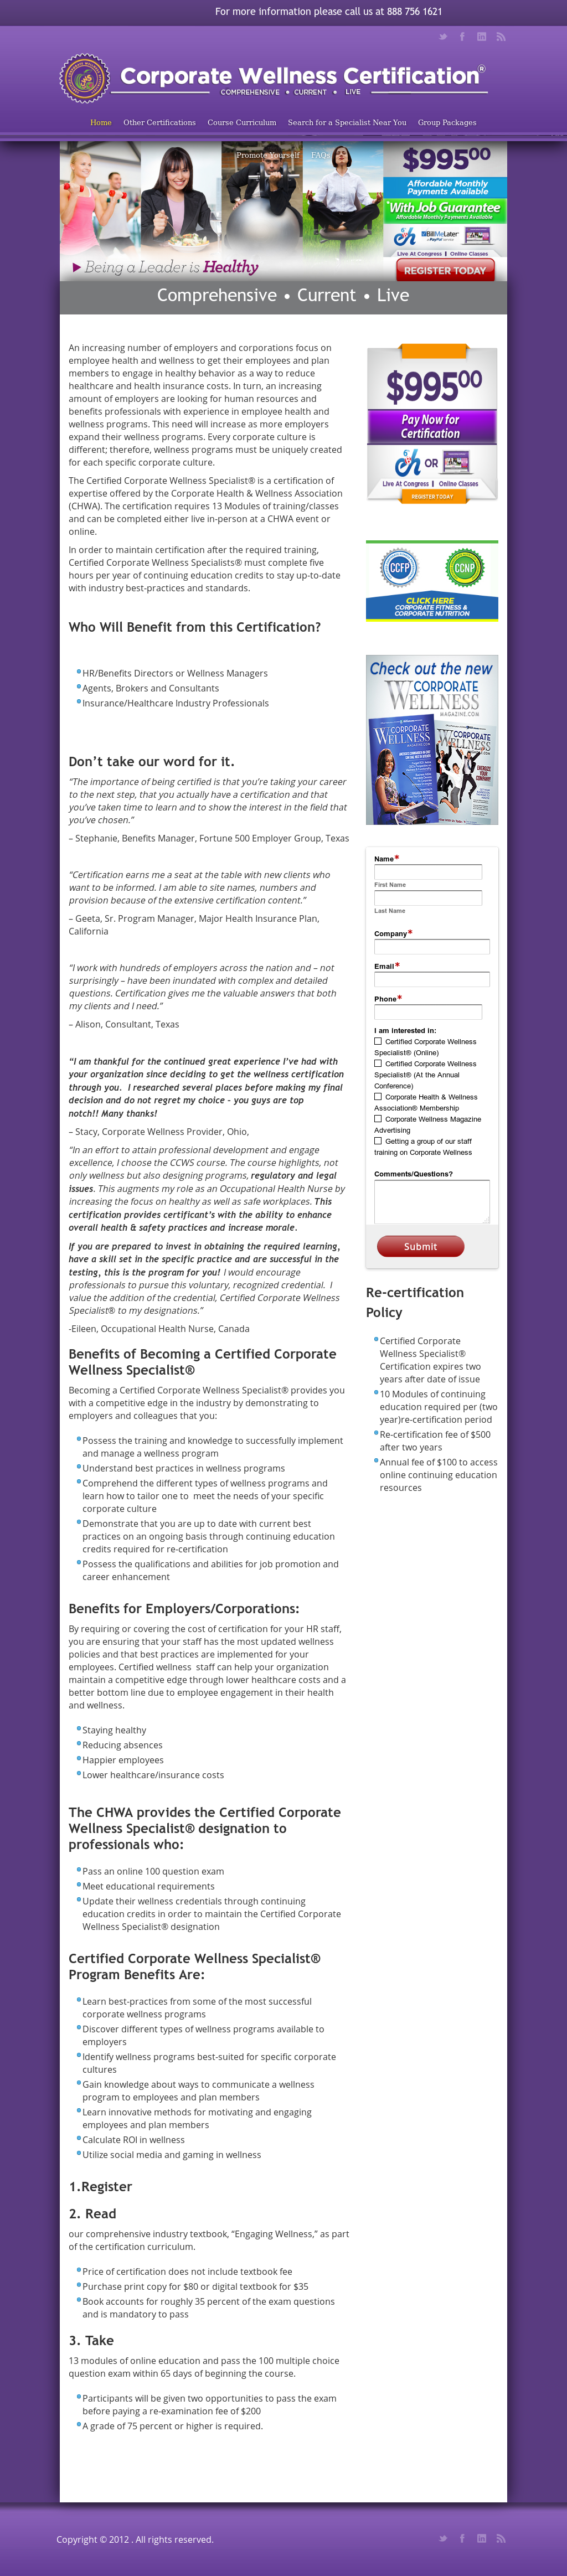 Corporate Health & Wellness Association Competitors, Revenue and